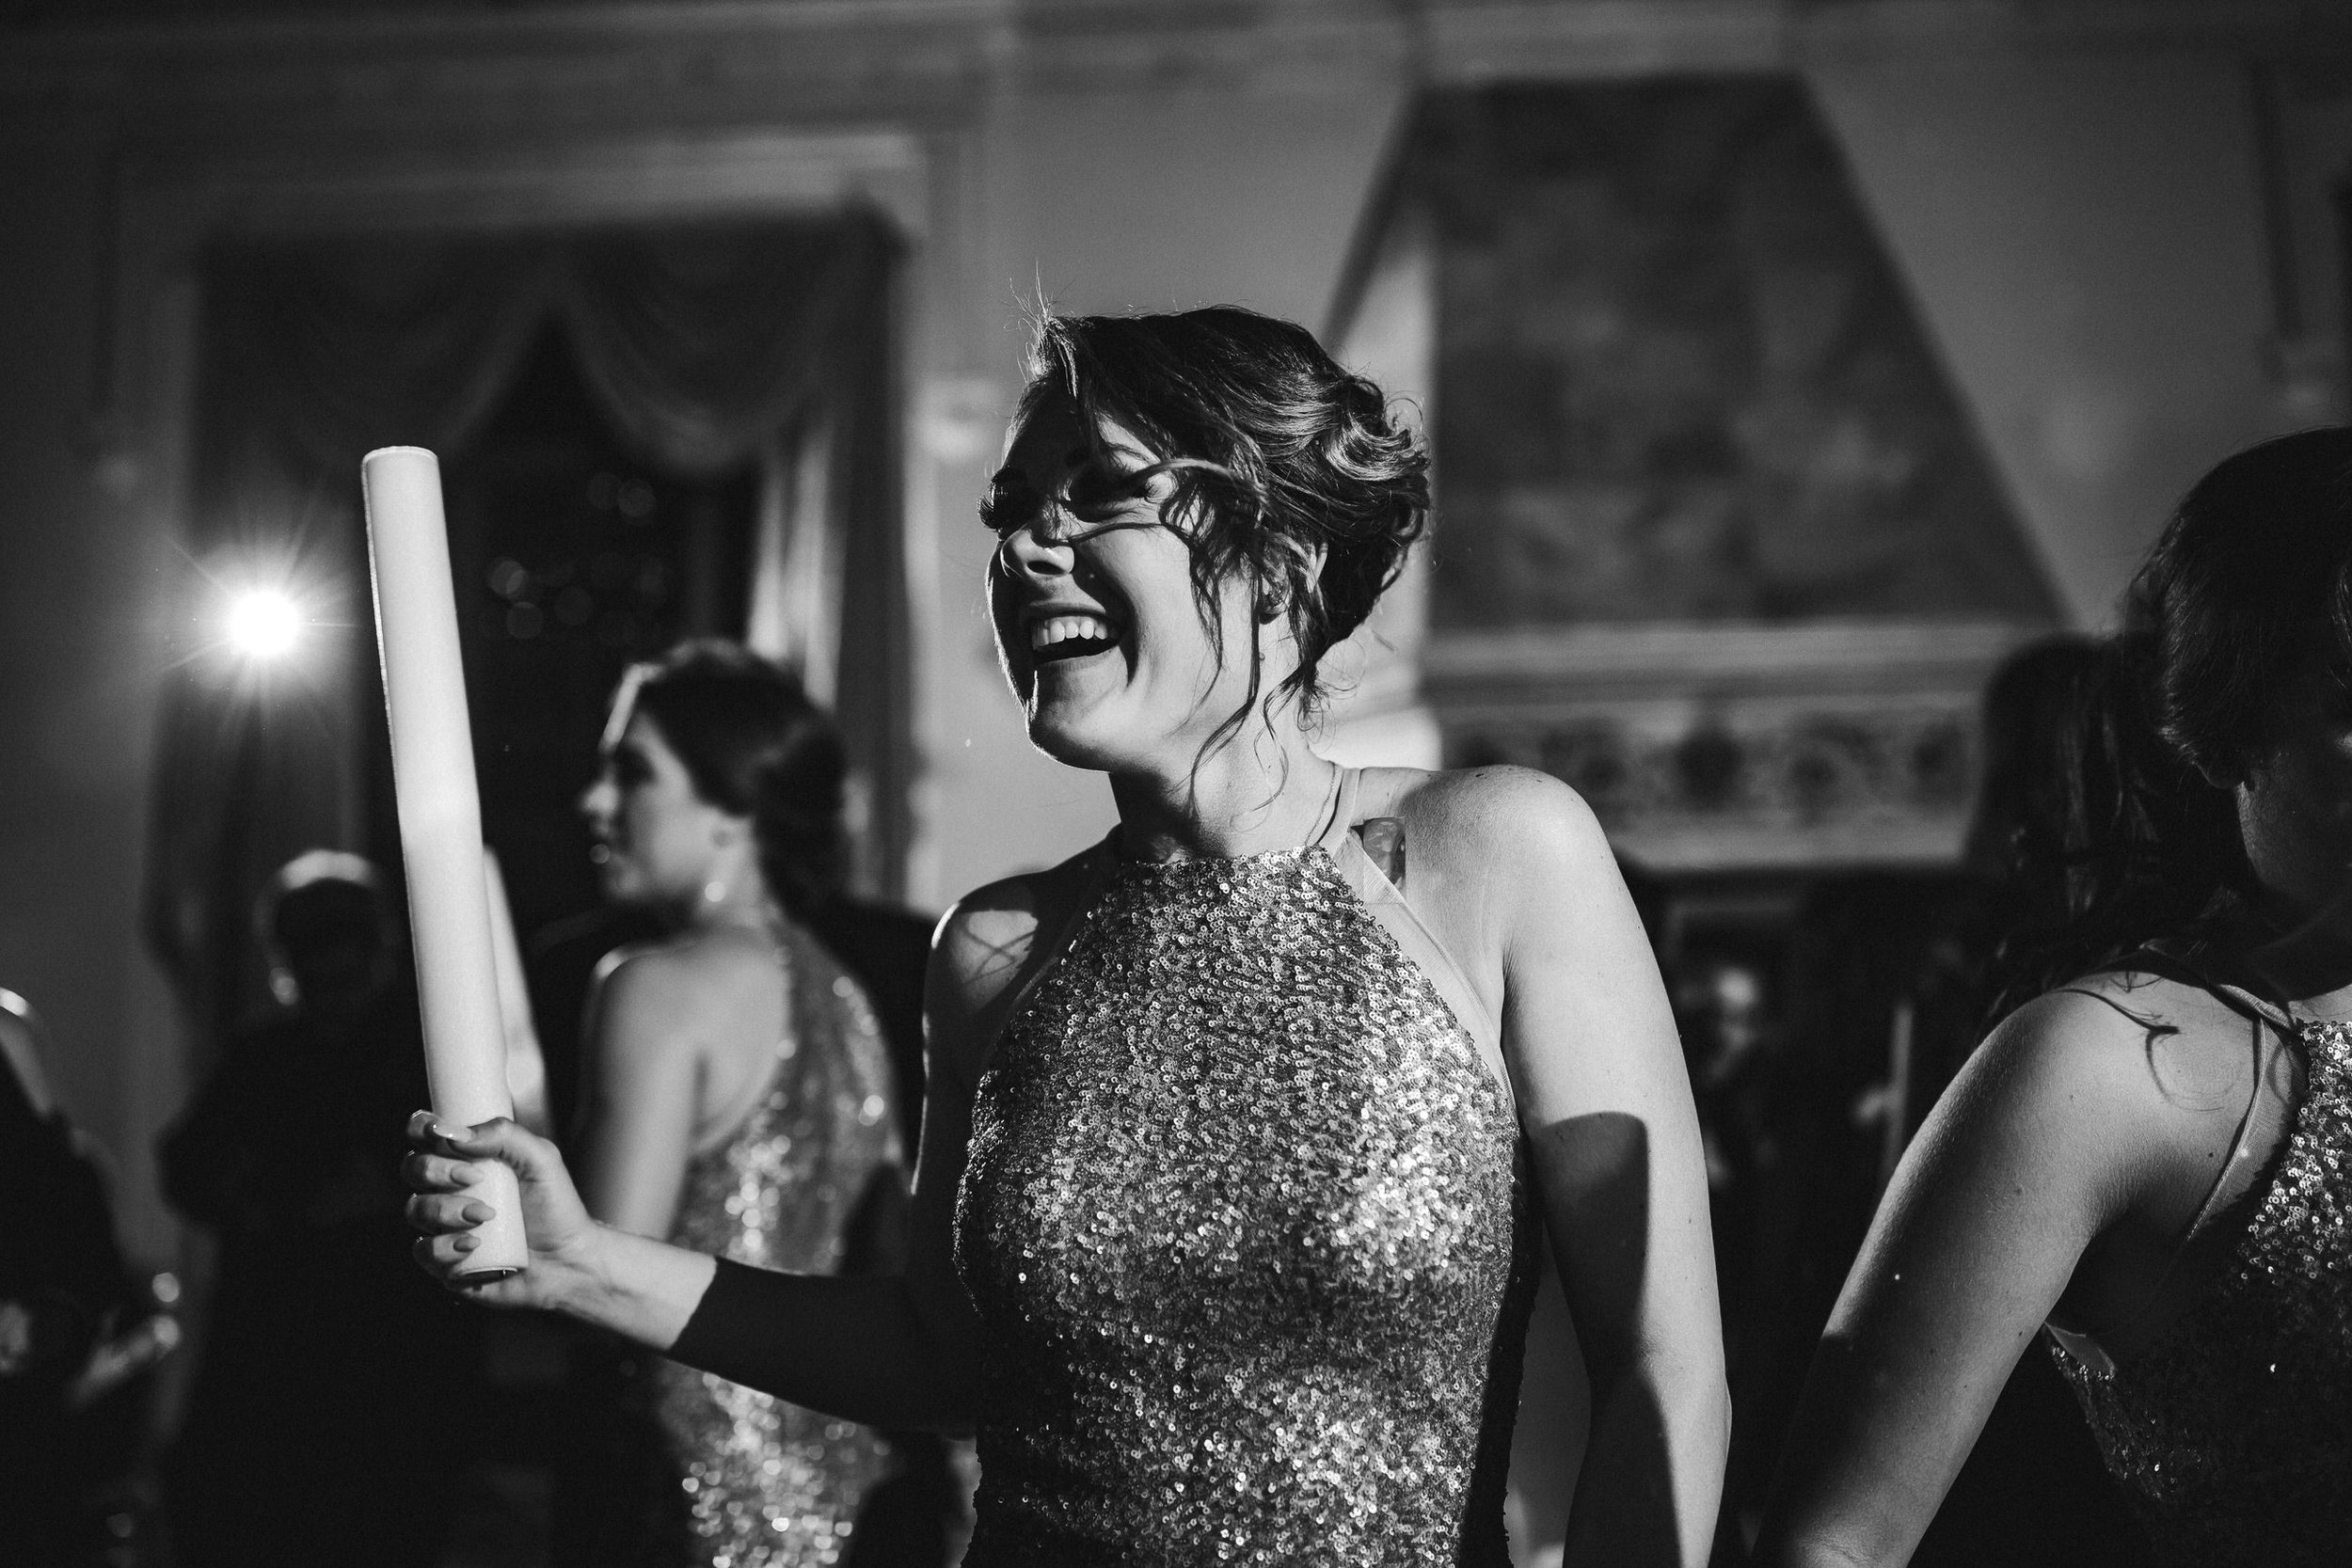 miami-biltmore-wedding-photographer-reception-party-42.jpg